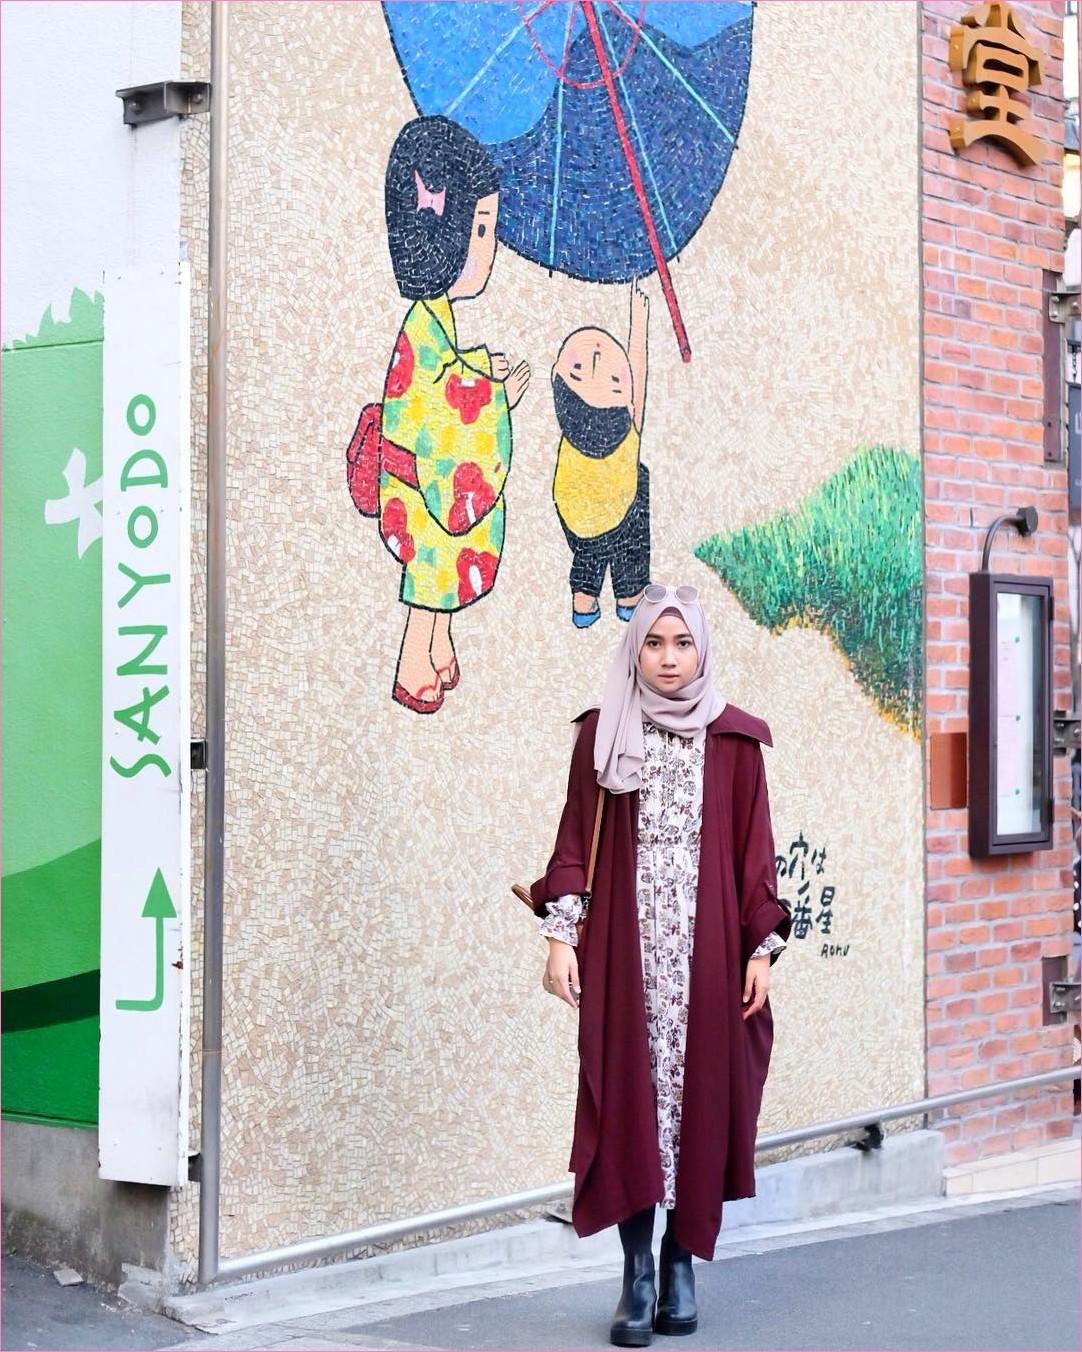 Outfit Kerudung Pashmina Ala Selebgram 2018 hijab pashmina sifon krem cardigan merah maroon ciput rajut baju abaya putih legging ankle boots hitam kacamata bulat ungu muda slingbags handbags coklat ootd trendy kekinian jepang